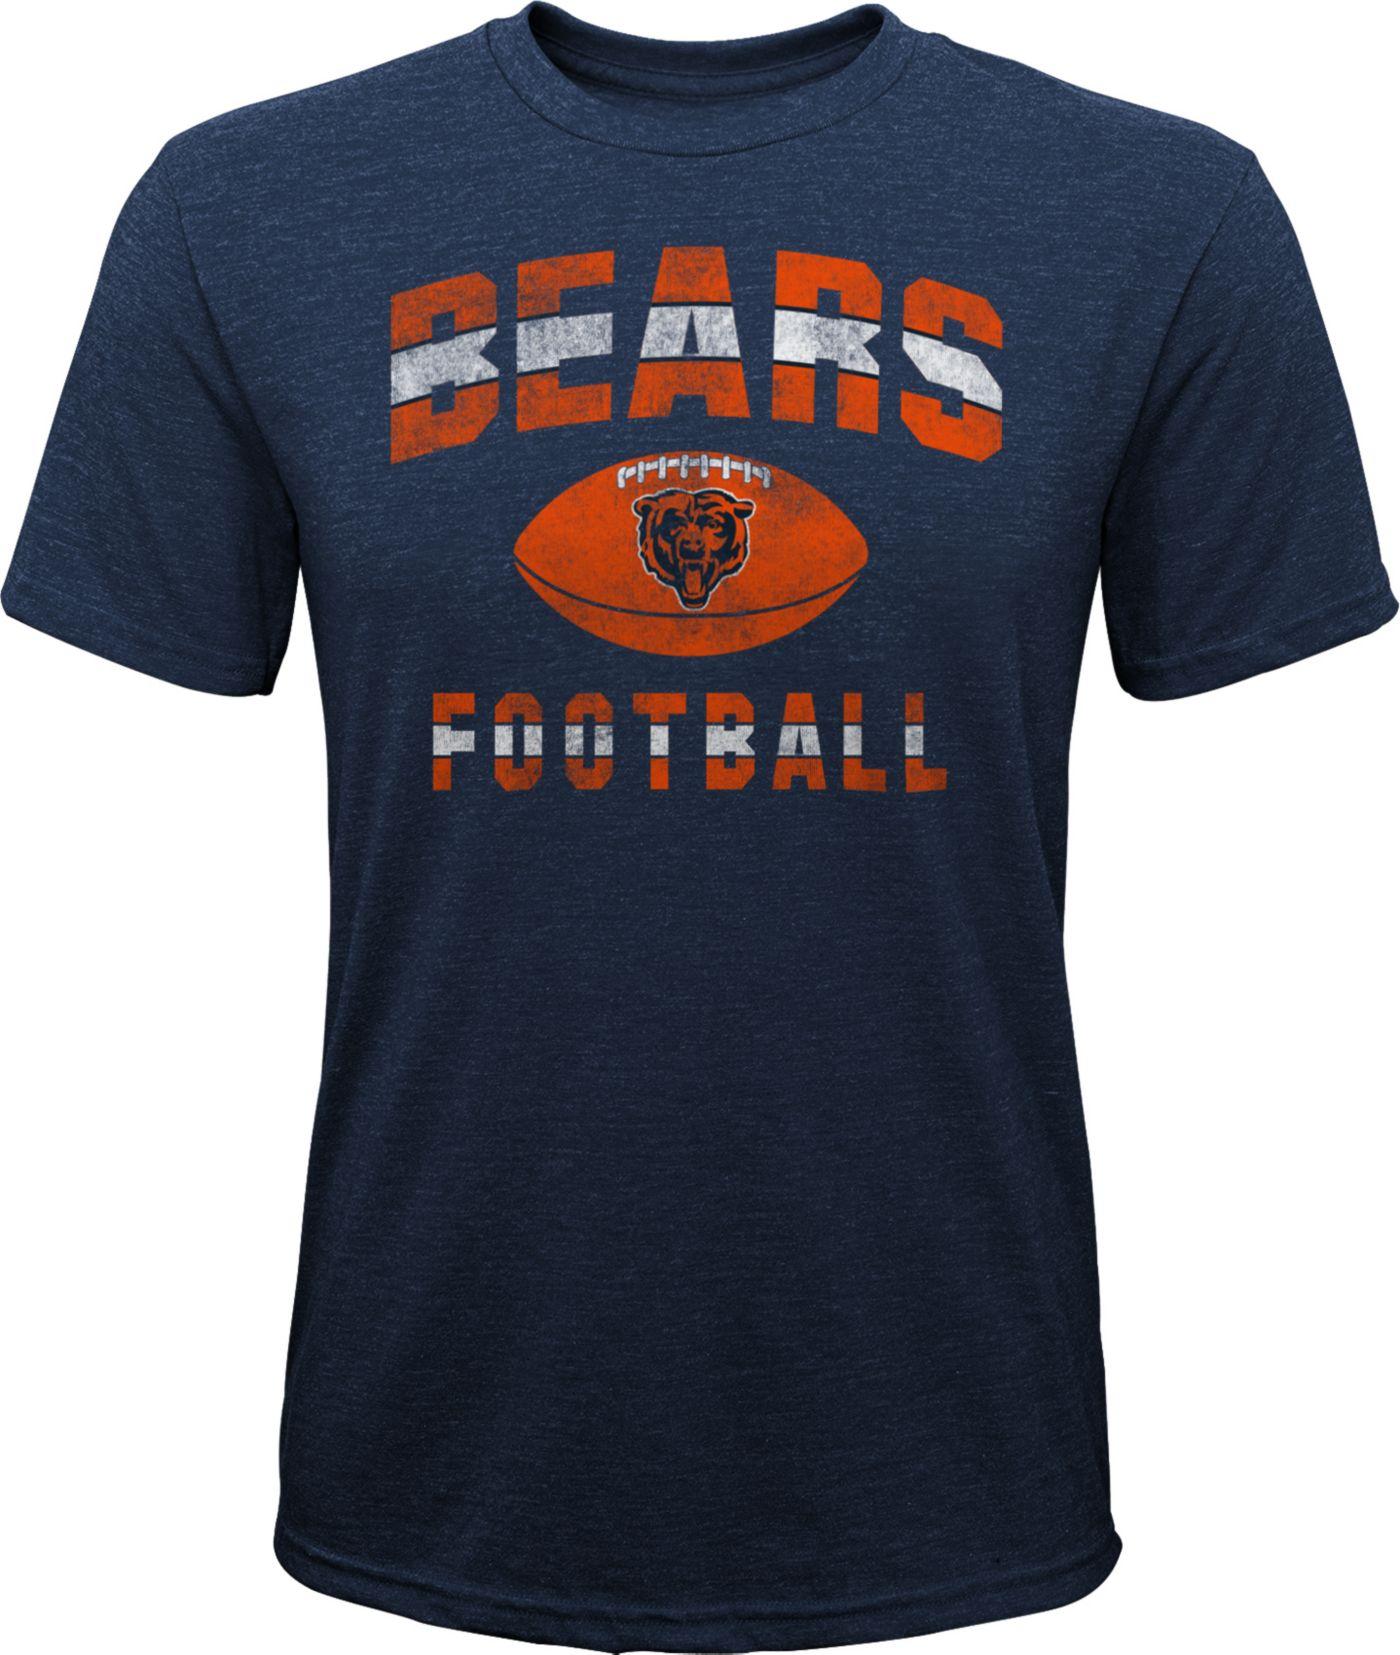 NFL Team Apparel Youth Chicago Bears Big Game Tri-Blend Navy T-Shirt